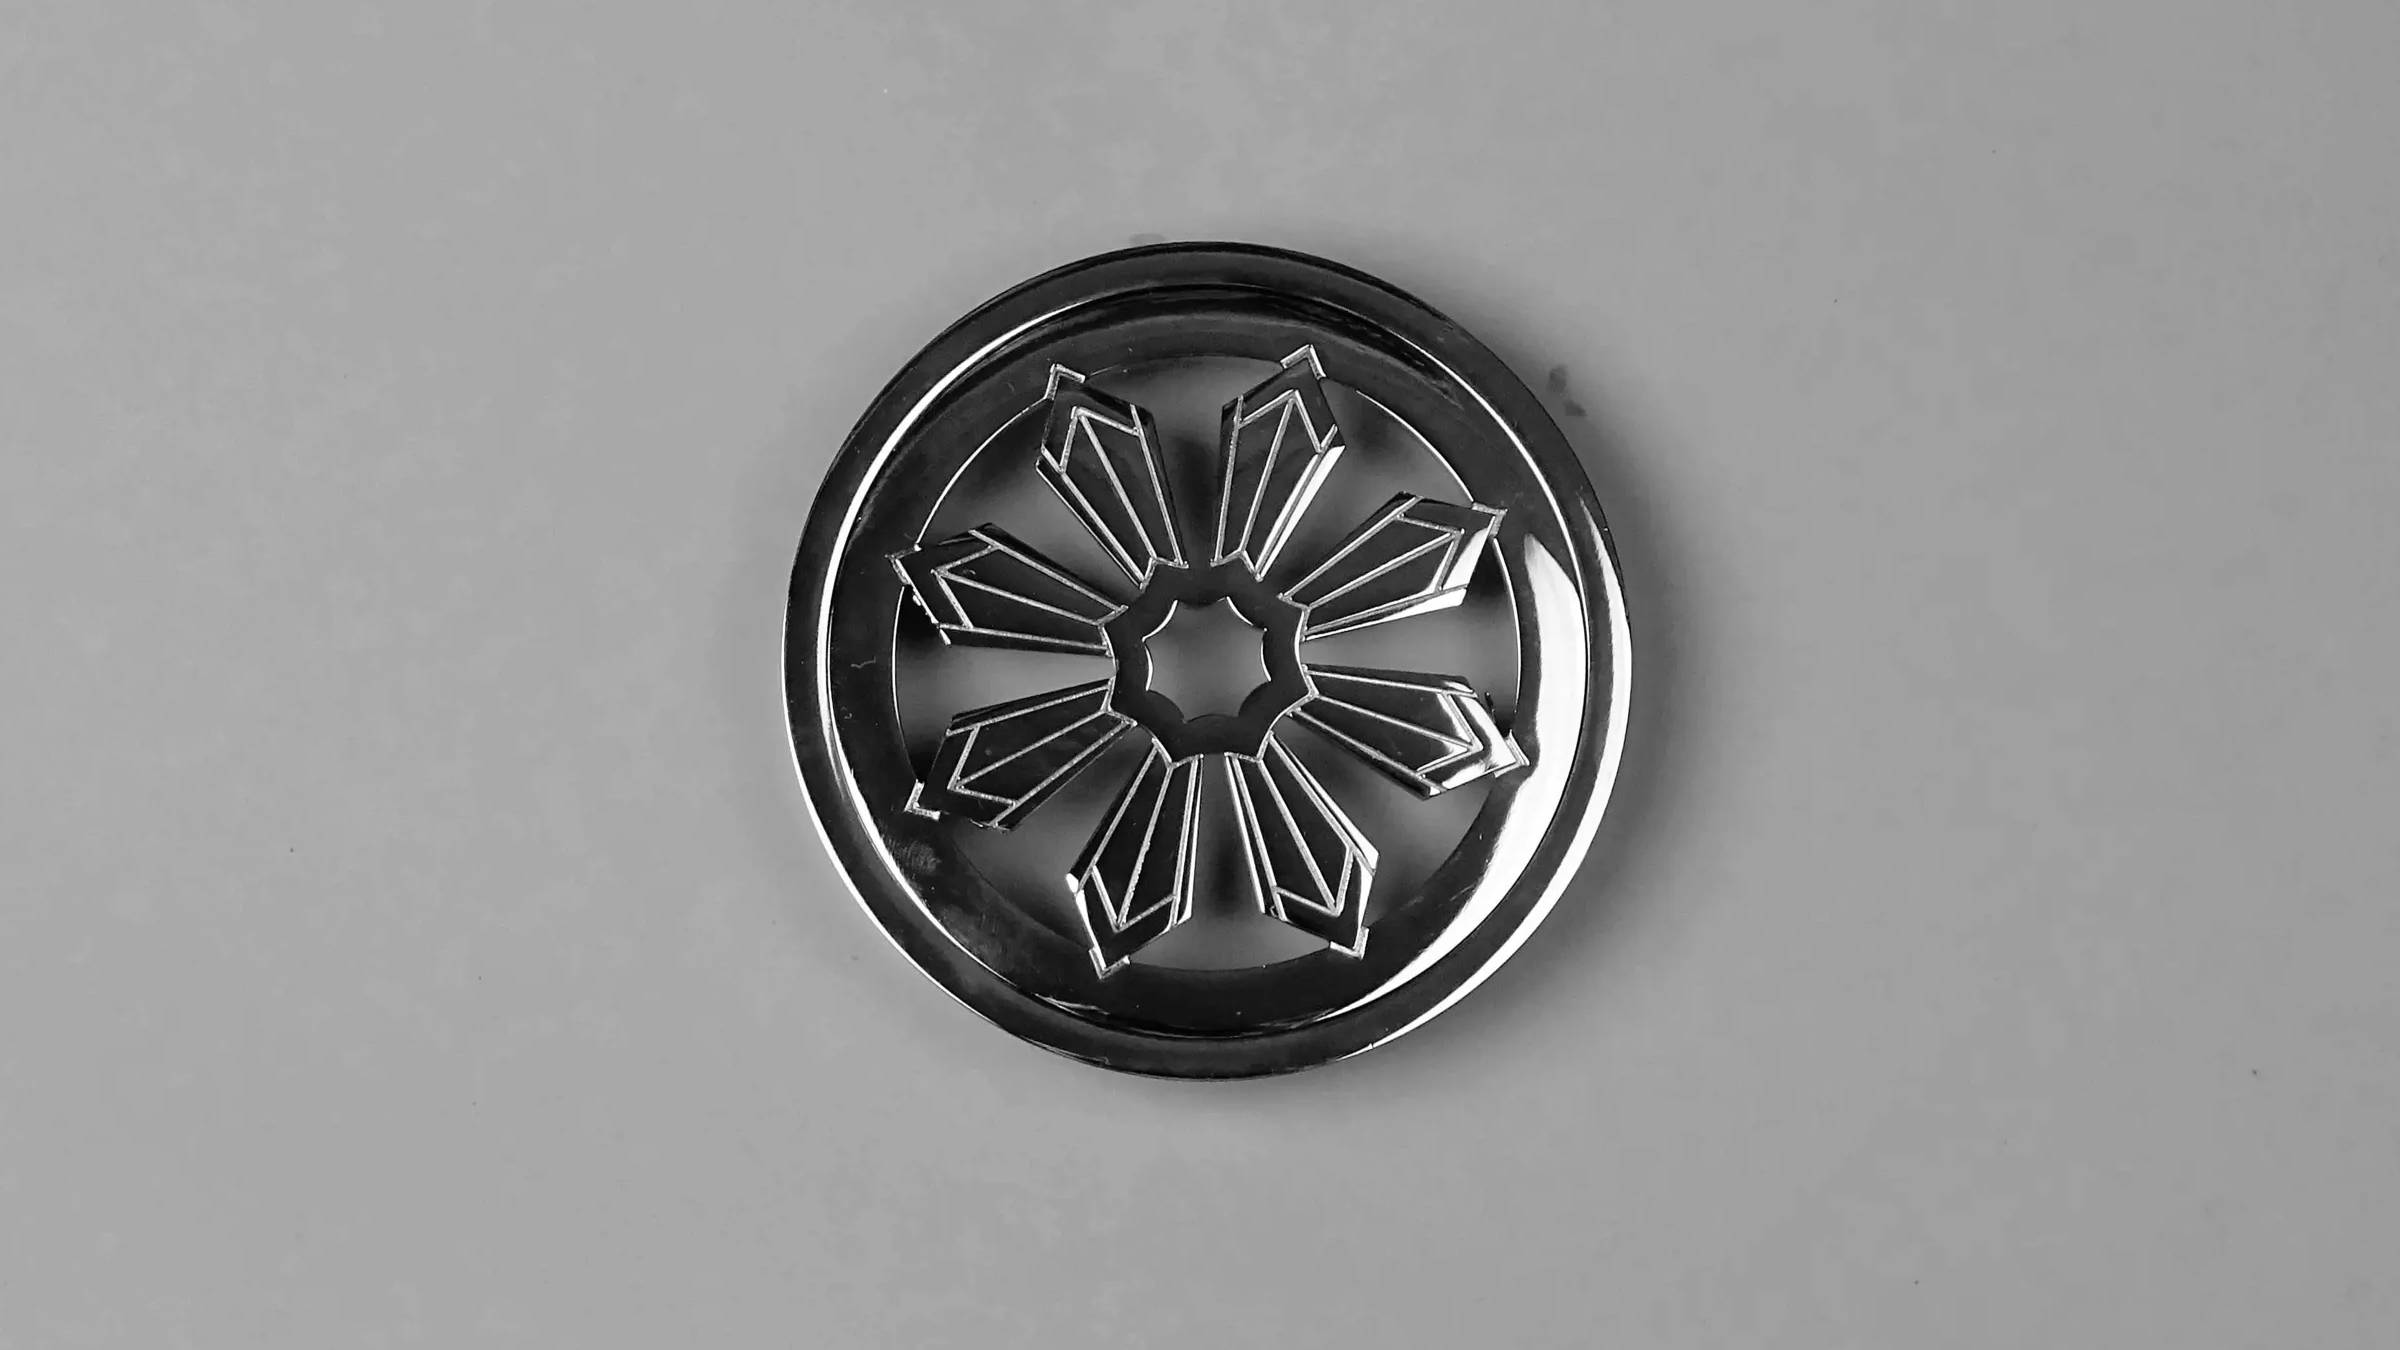 Federation Chrome Round Shower Drain Grate